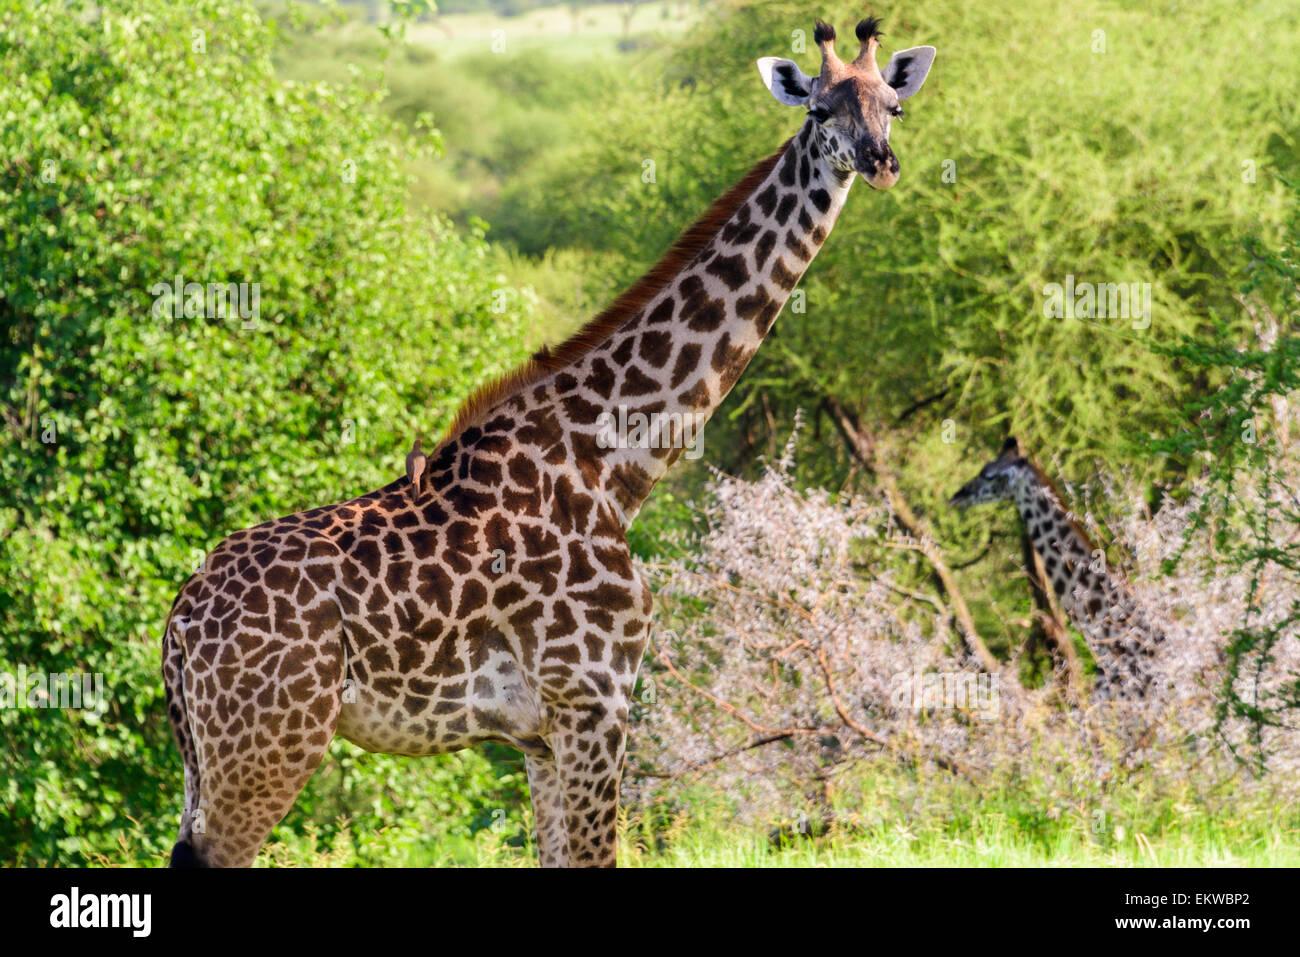 Giraffa camelopardalis Portrait de girafe Parc national de Tarangire, Manyara Région, la Tanzanie, l'Afrique. Photo Stock